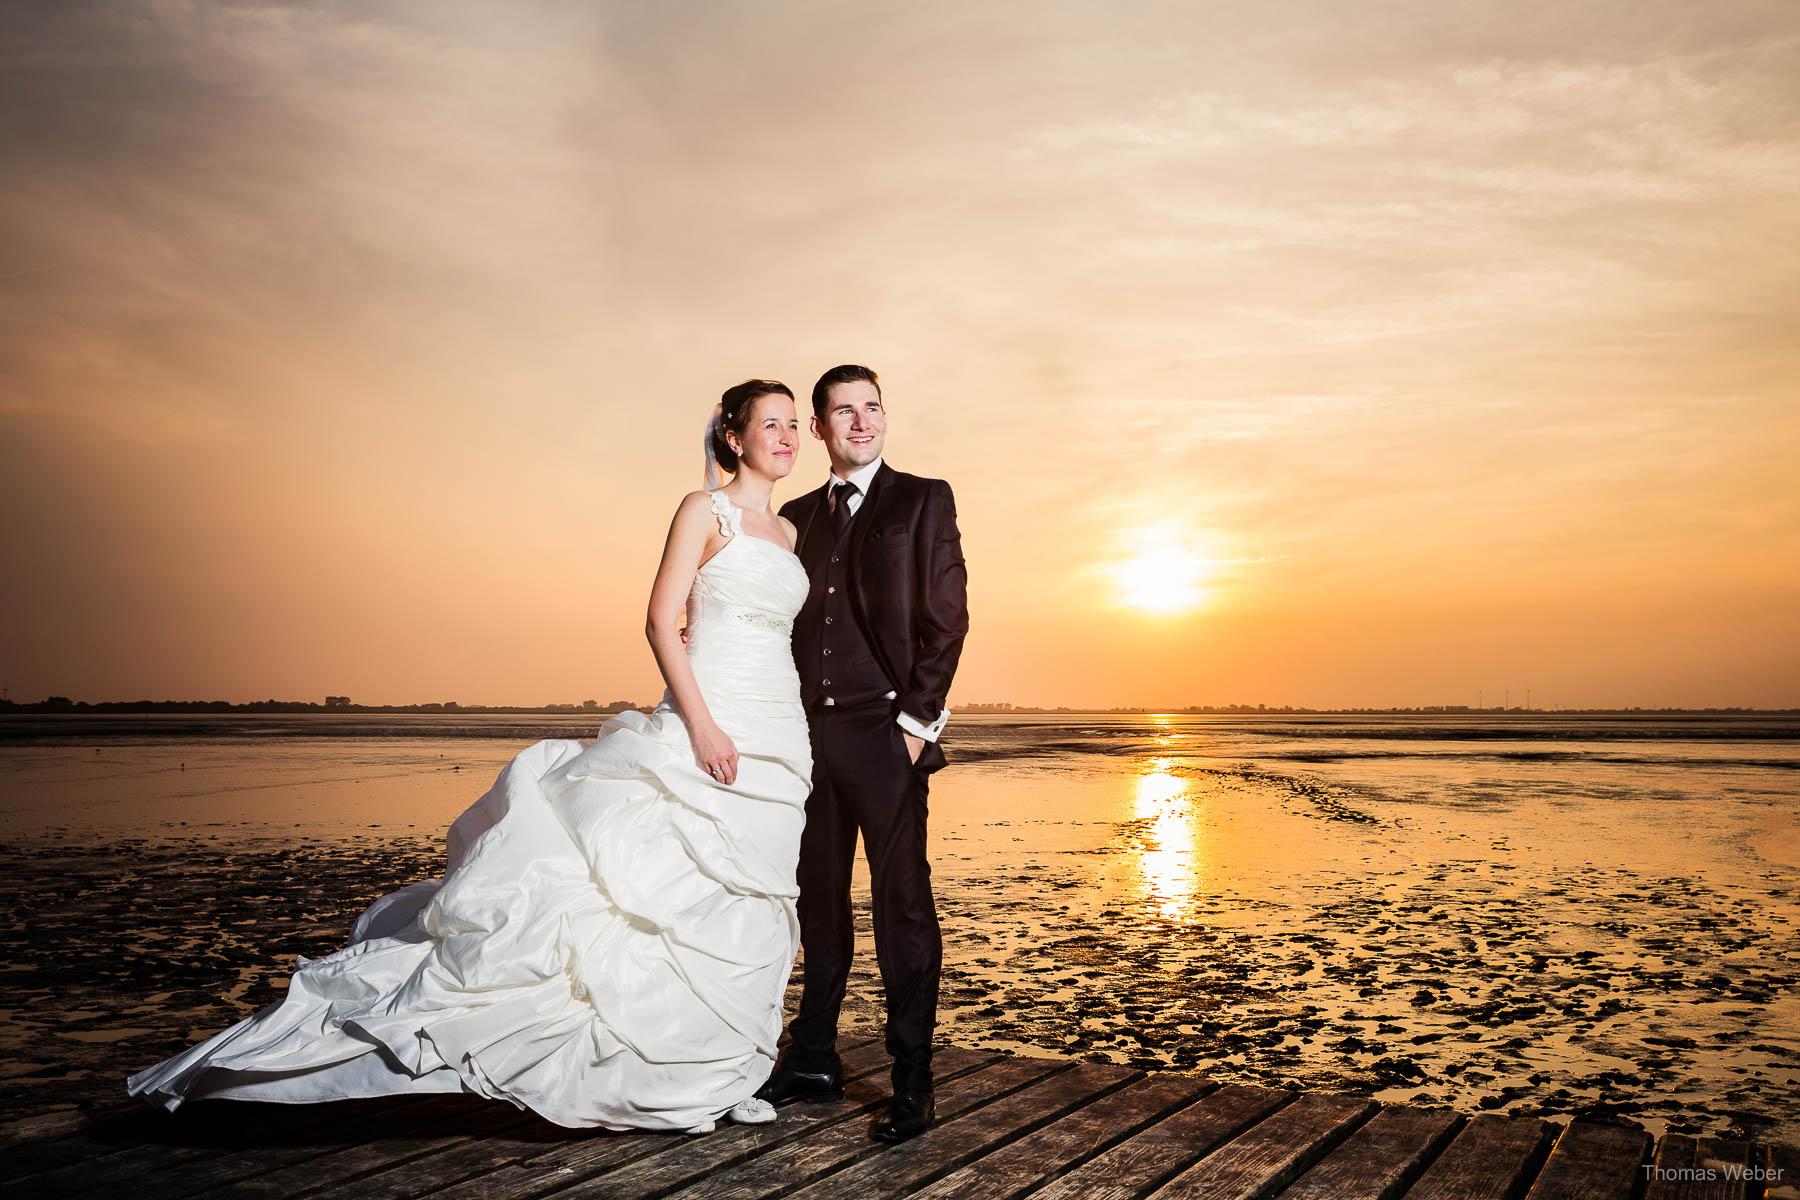 After Wedding Shooting in Ostfriesland Dangast Varel